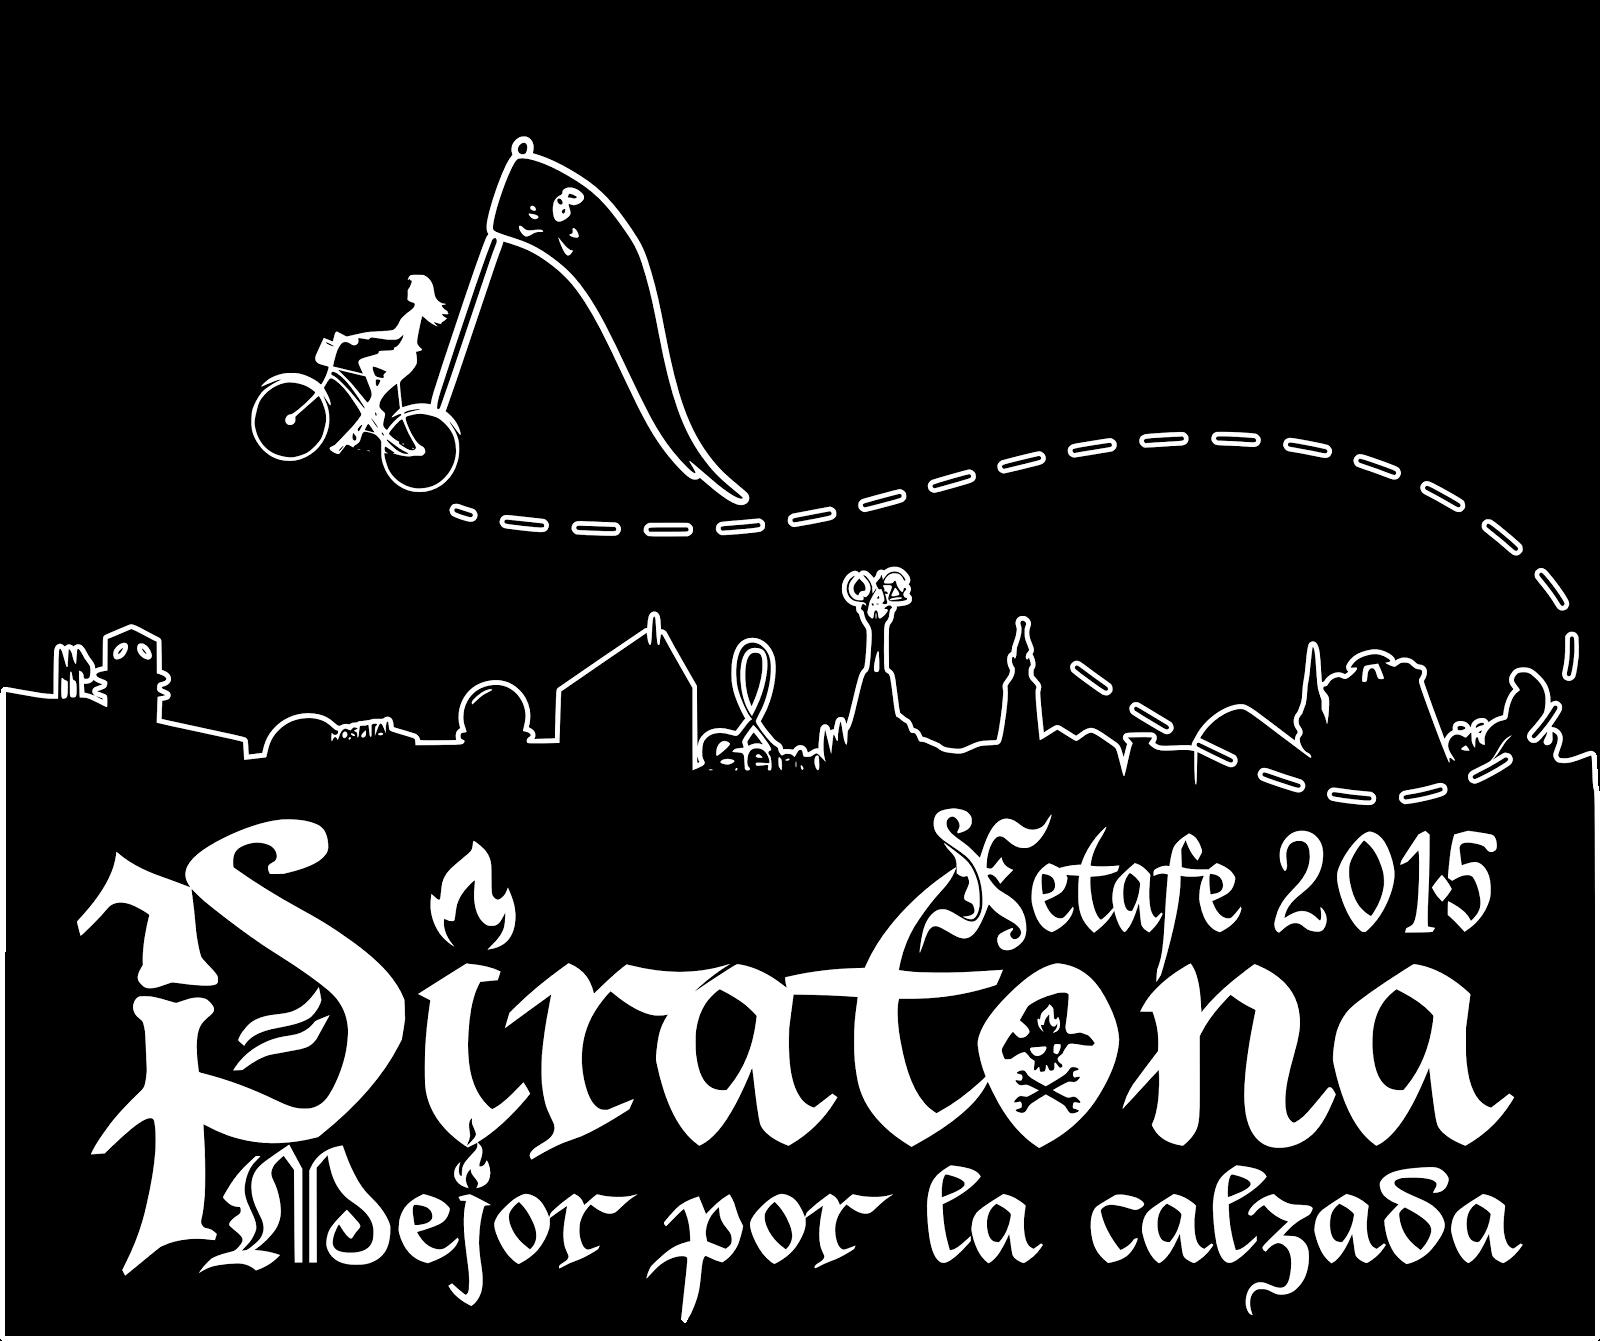 Piratona Xetafe 2015